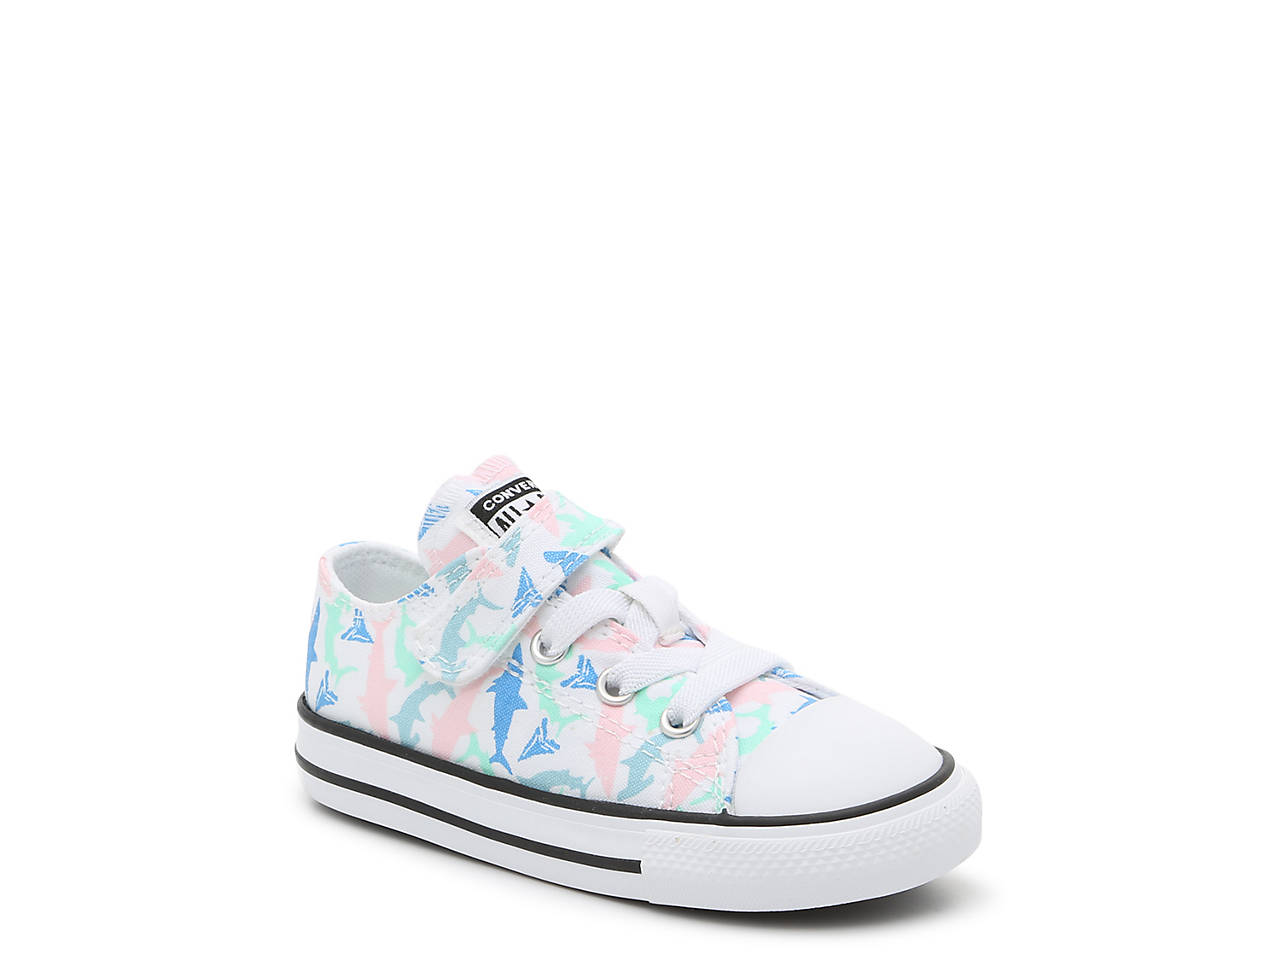 Converse Chuck Taylor All Star 1V Shark Bite Sneaker Kids